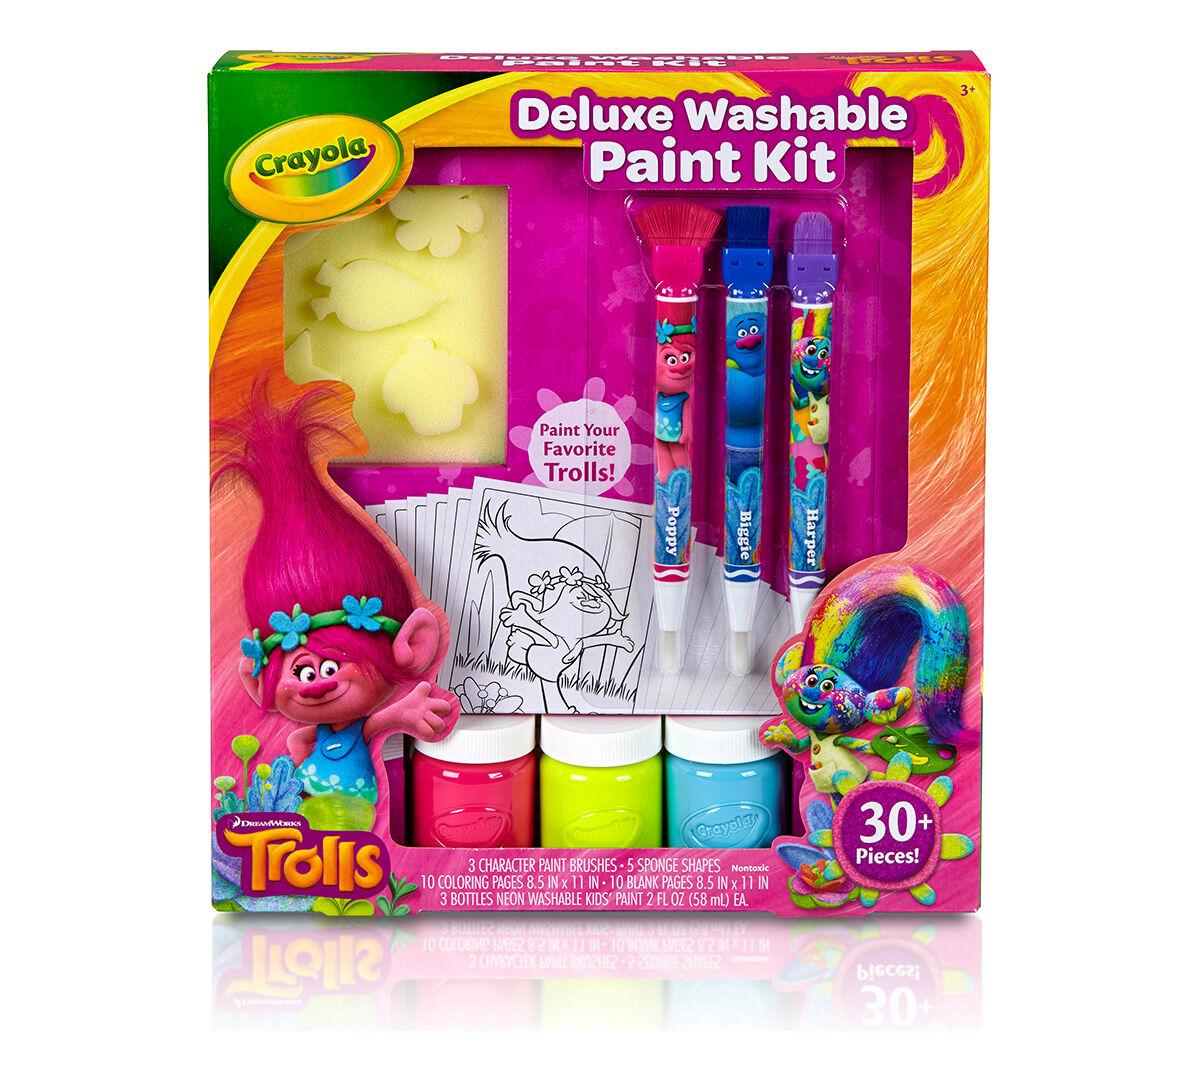 Trolls deluxe washable paint kit crayola trolls deluxe washable paint kit sciox Gallery